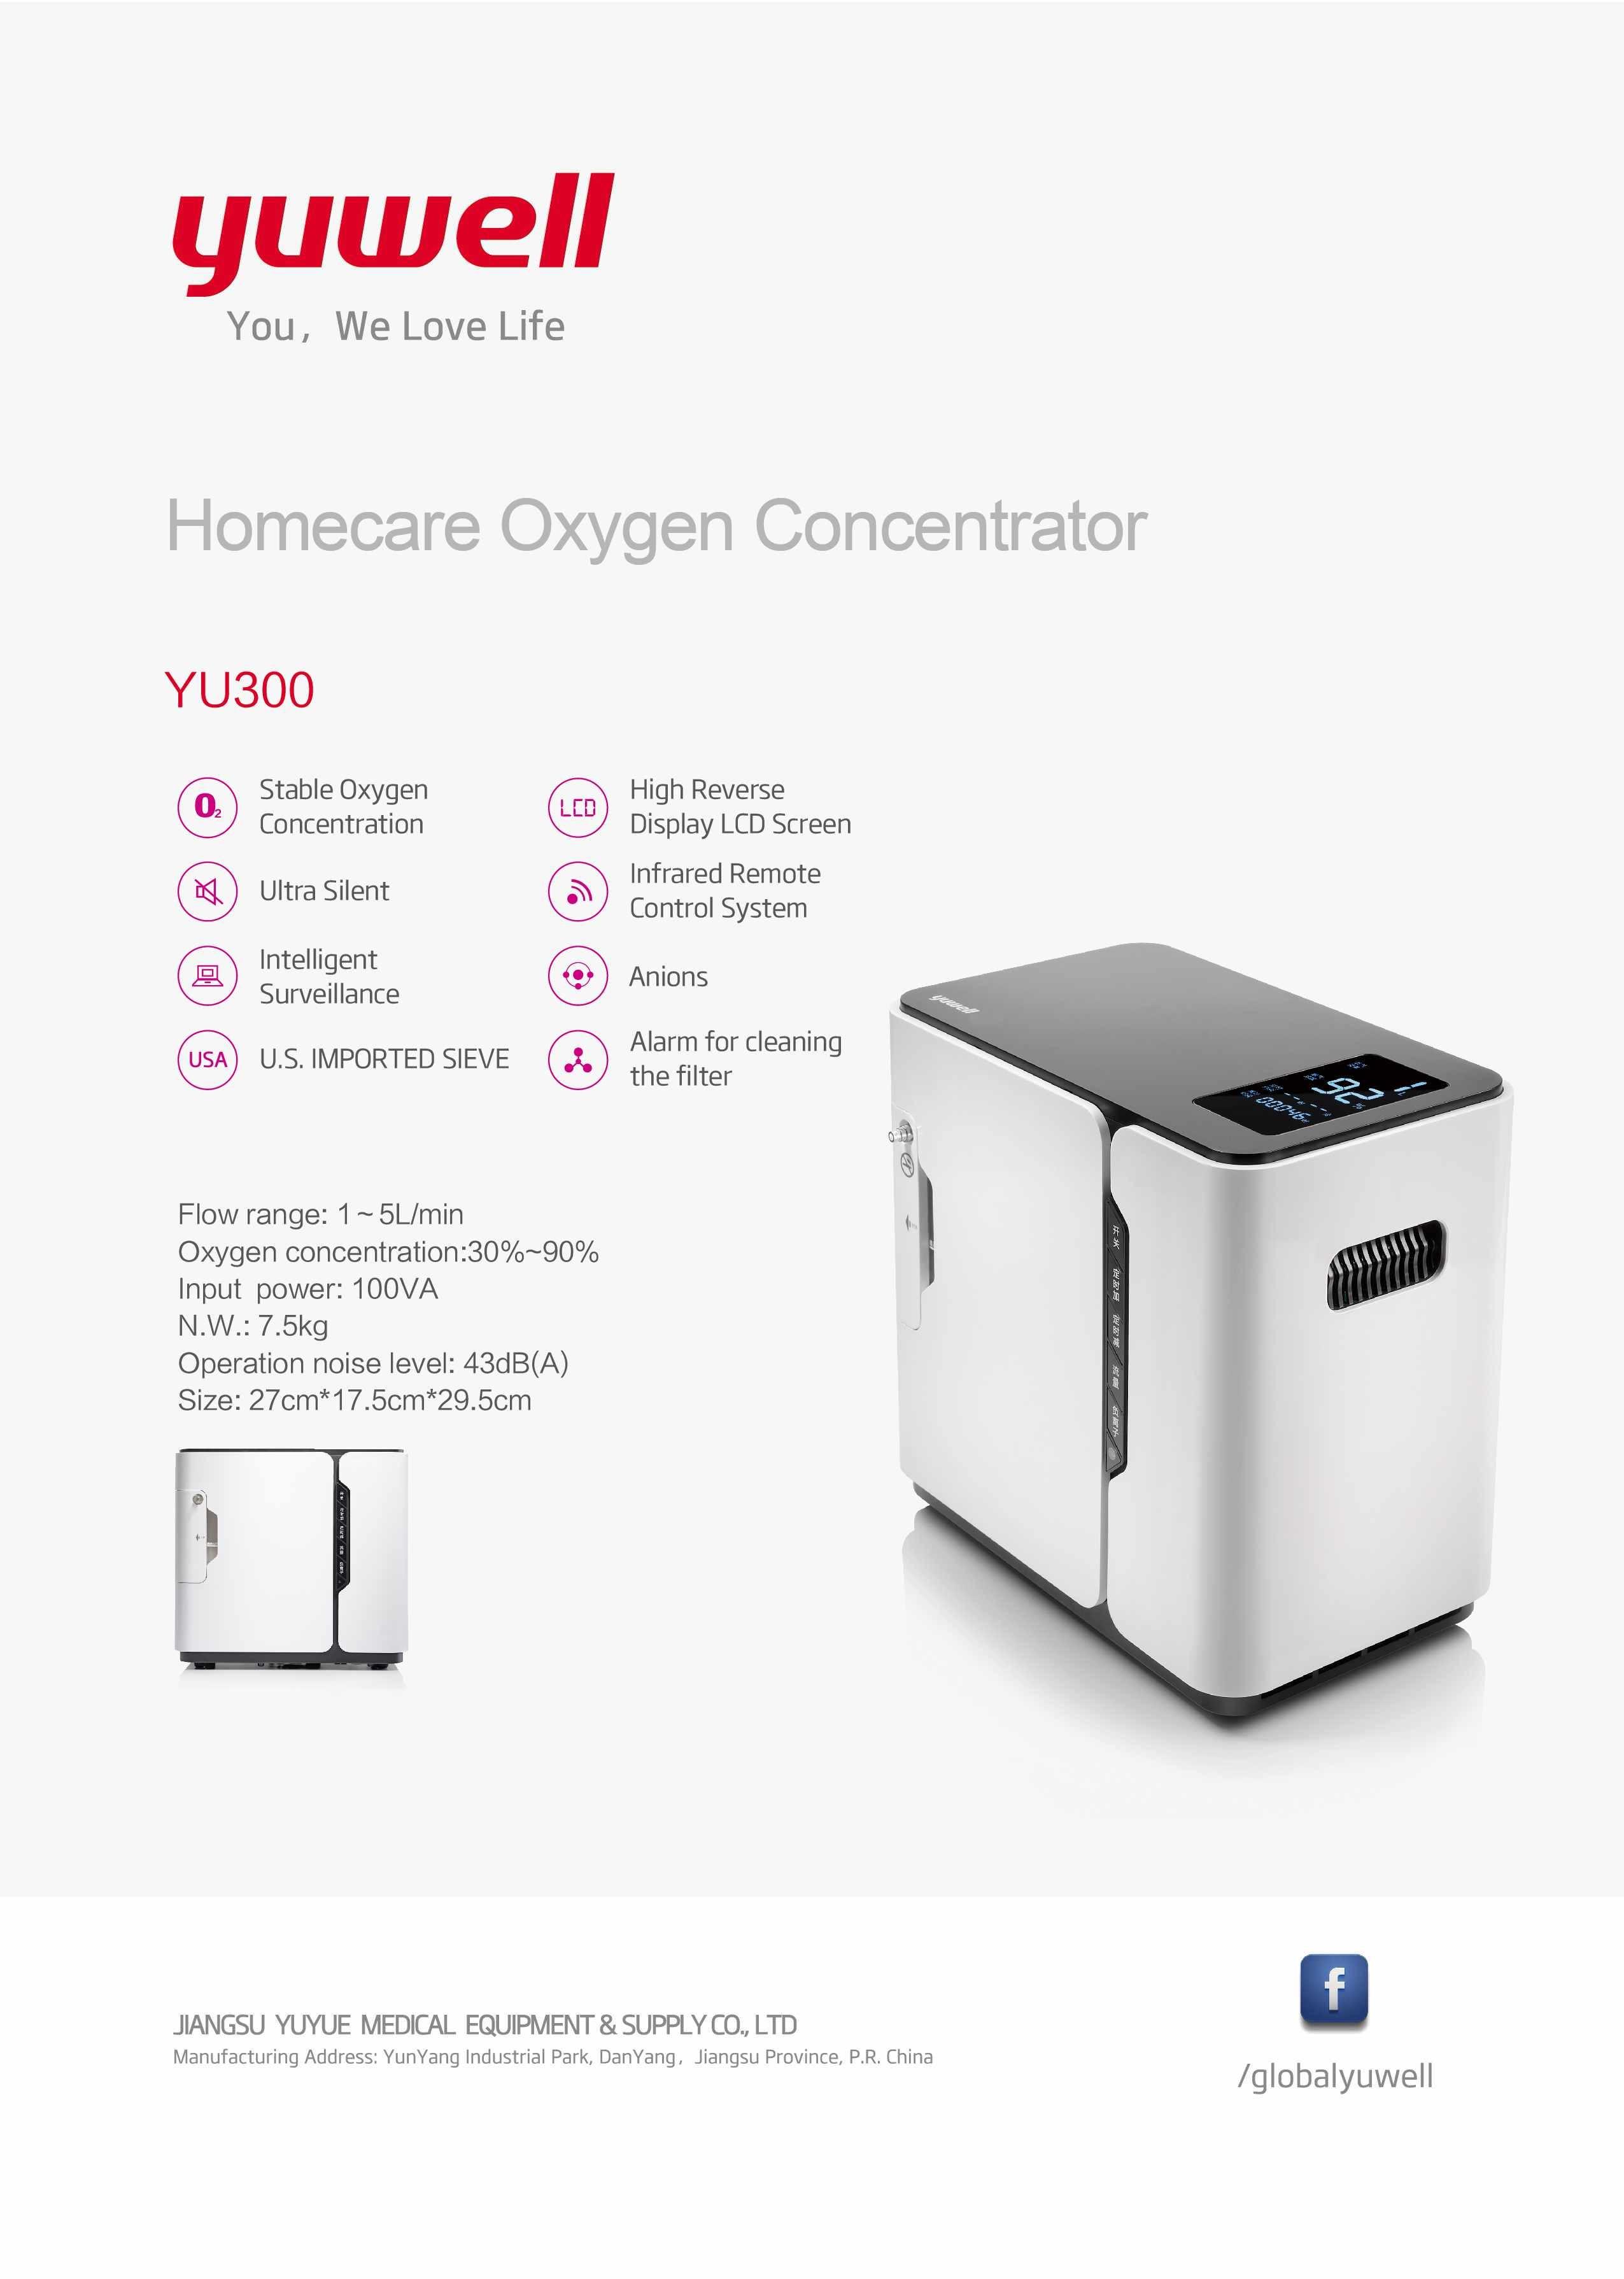 US $358 2 10% OFF|yuwell YU300 oxygen concentrator portable oxygen  generator medical oxygen machine homecare medical equipment-in Oxygen  Machine from